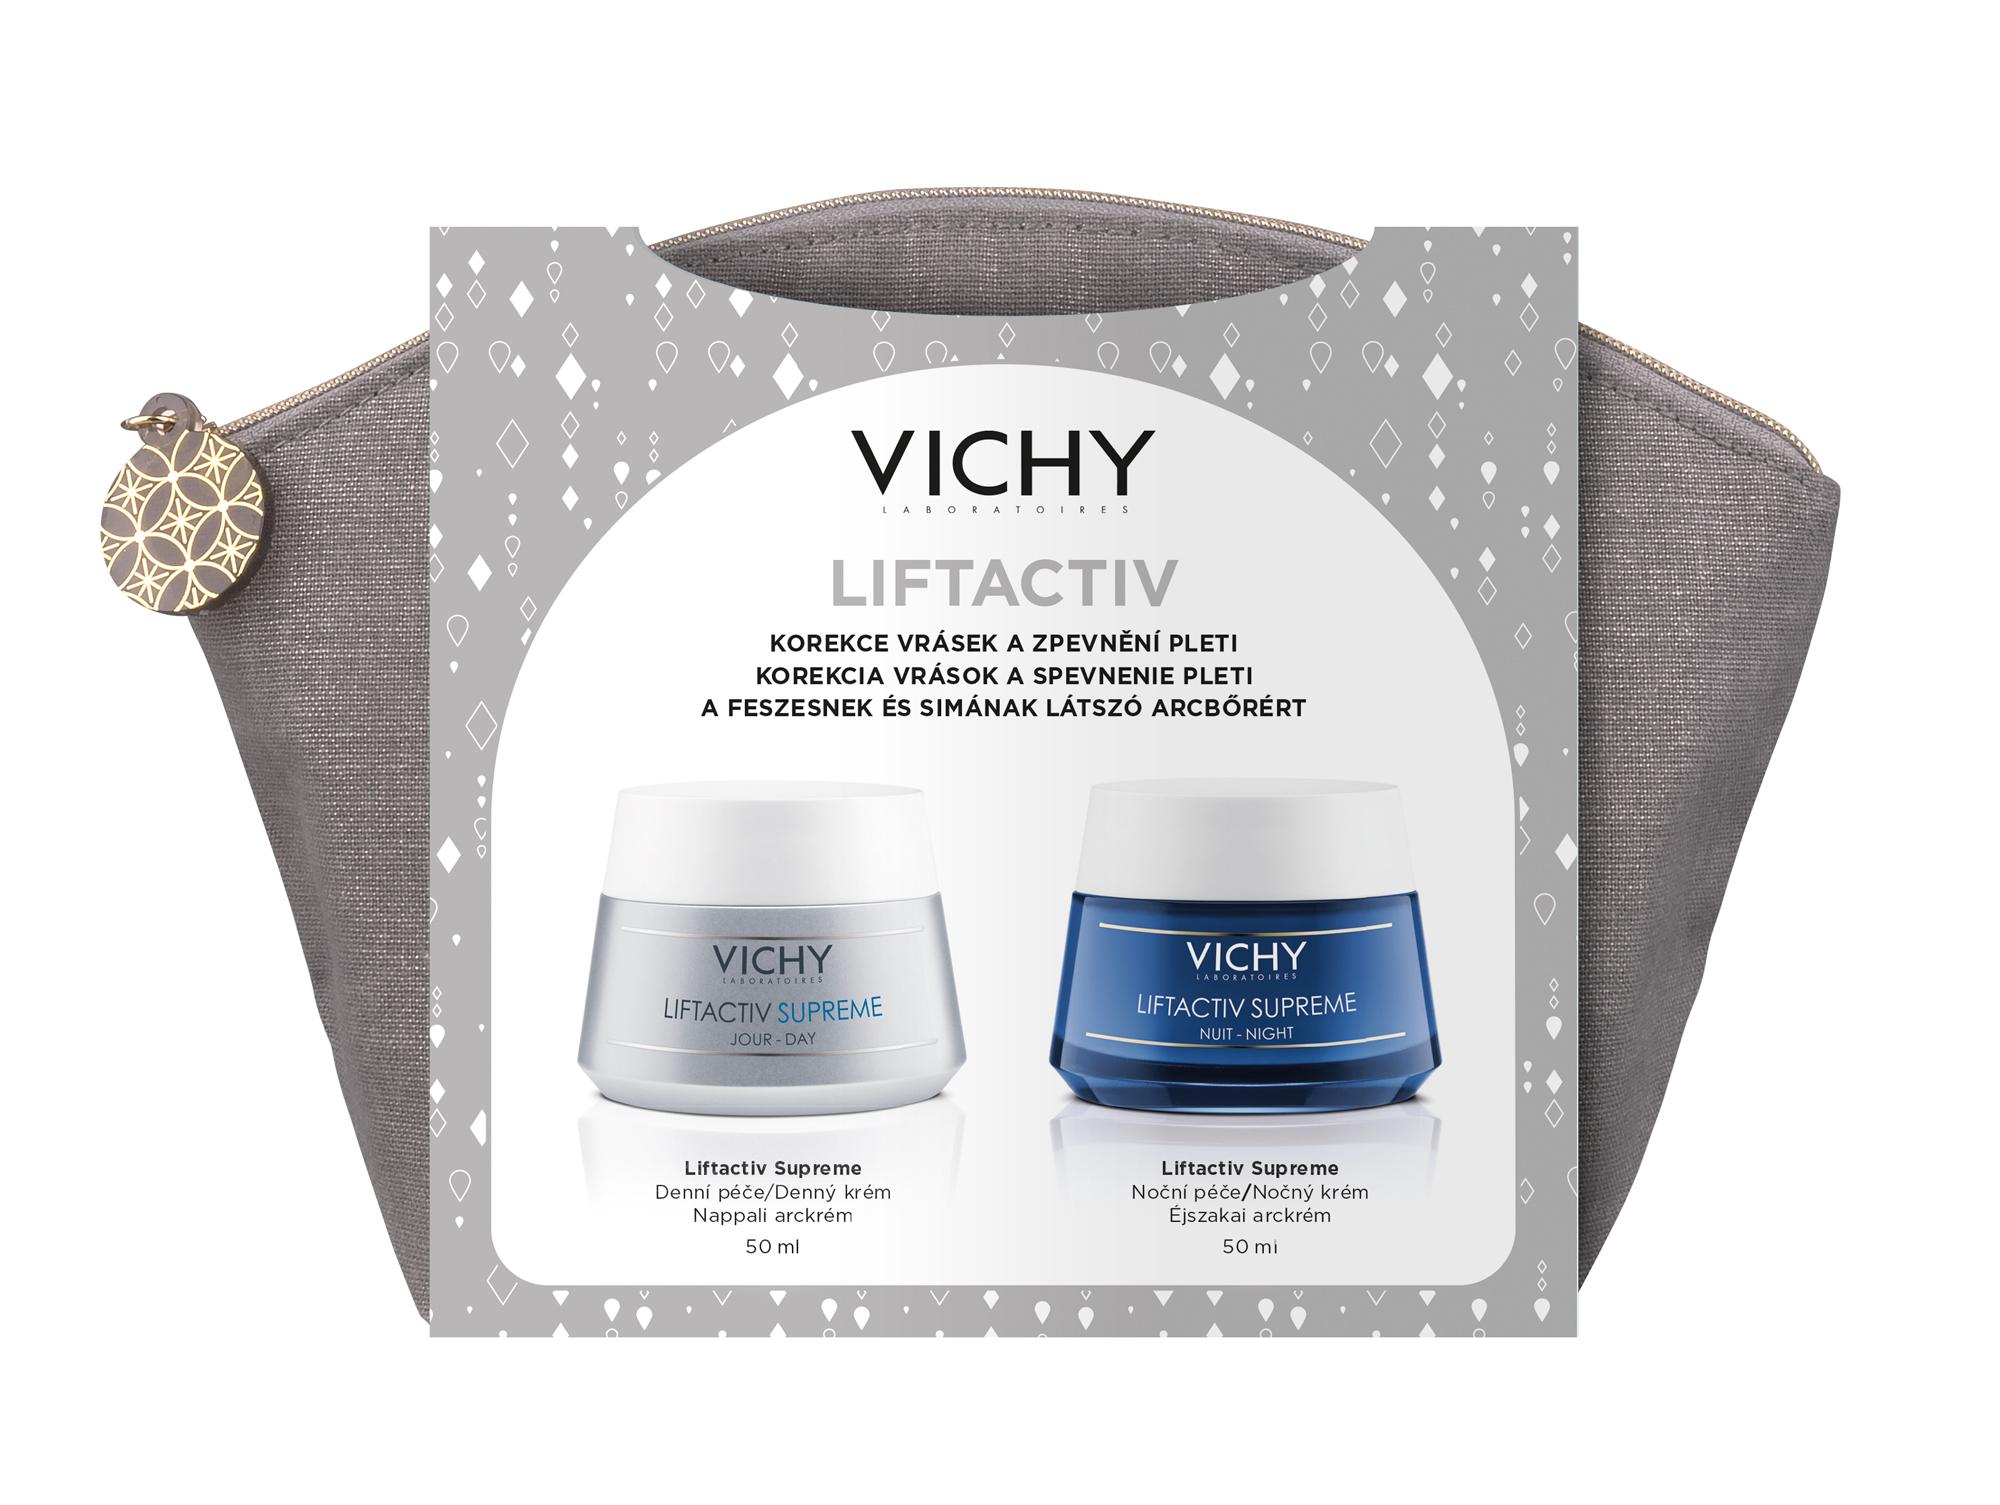 vichy-liftactiv-csomag-xmas-2018-5050ml